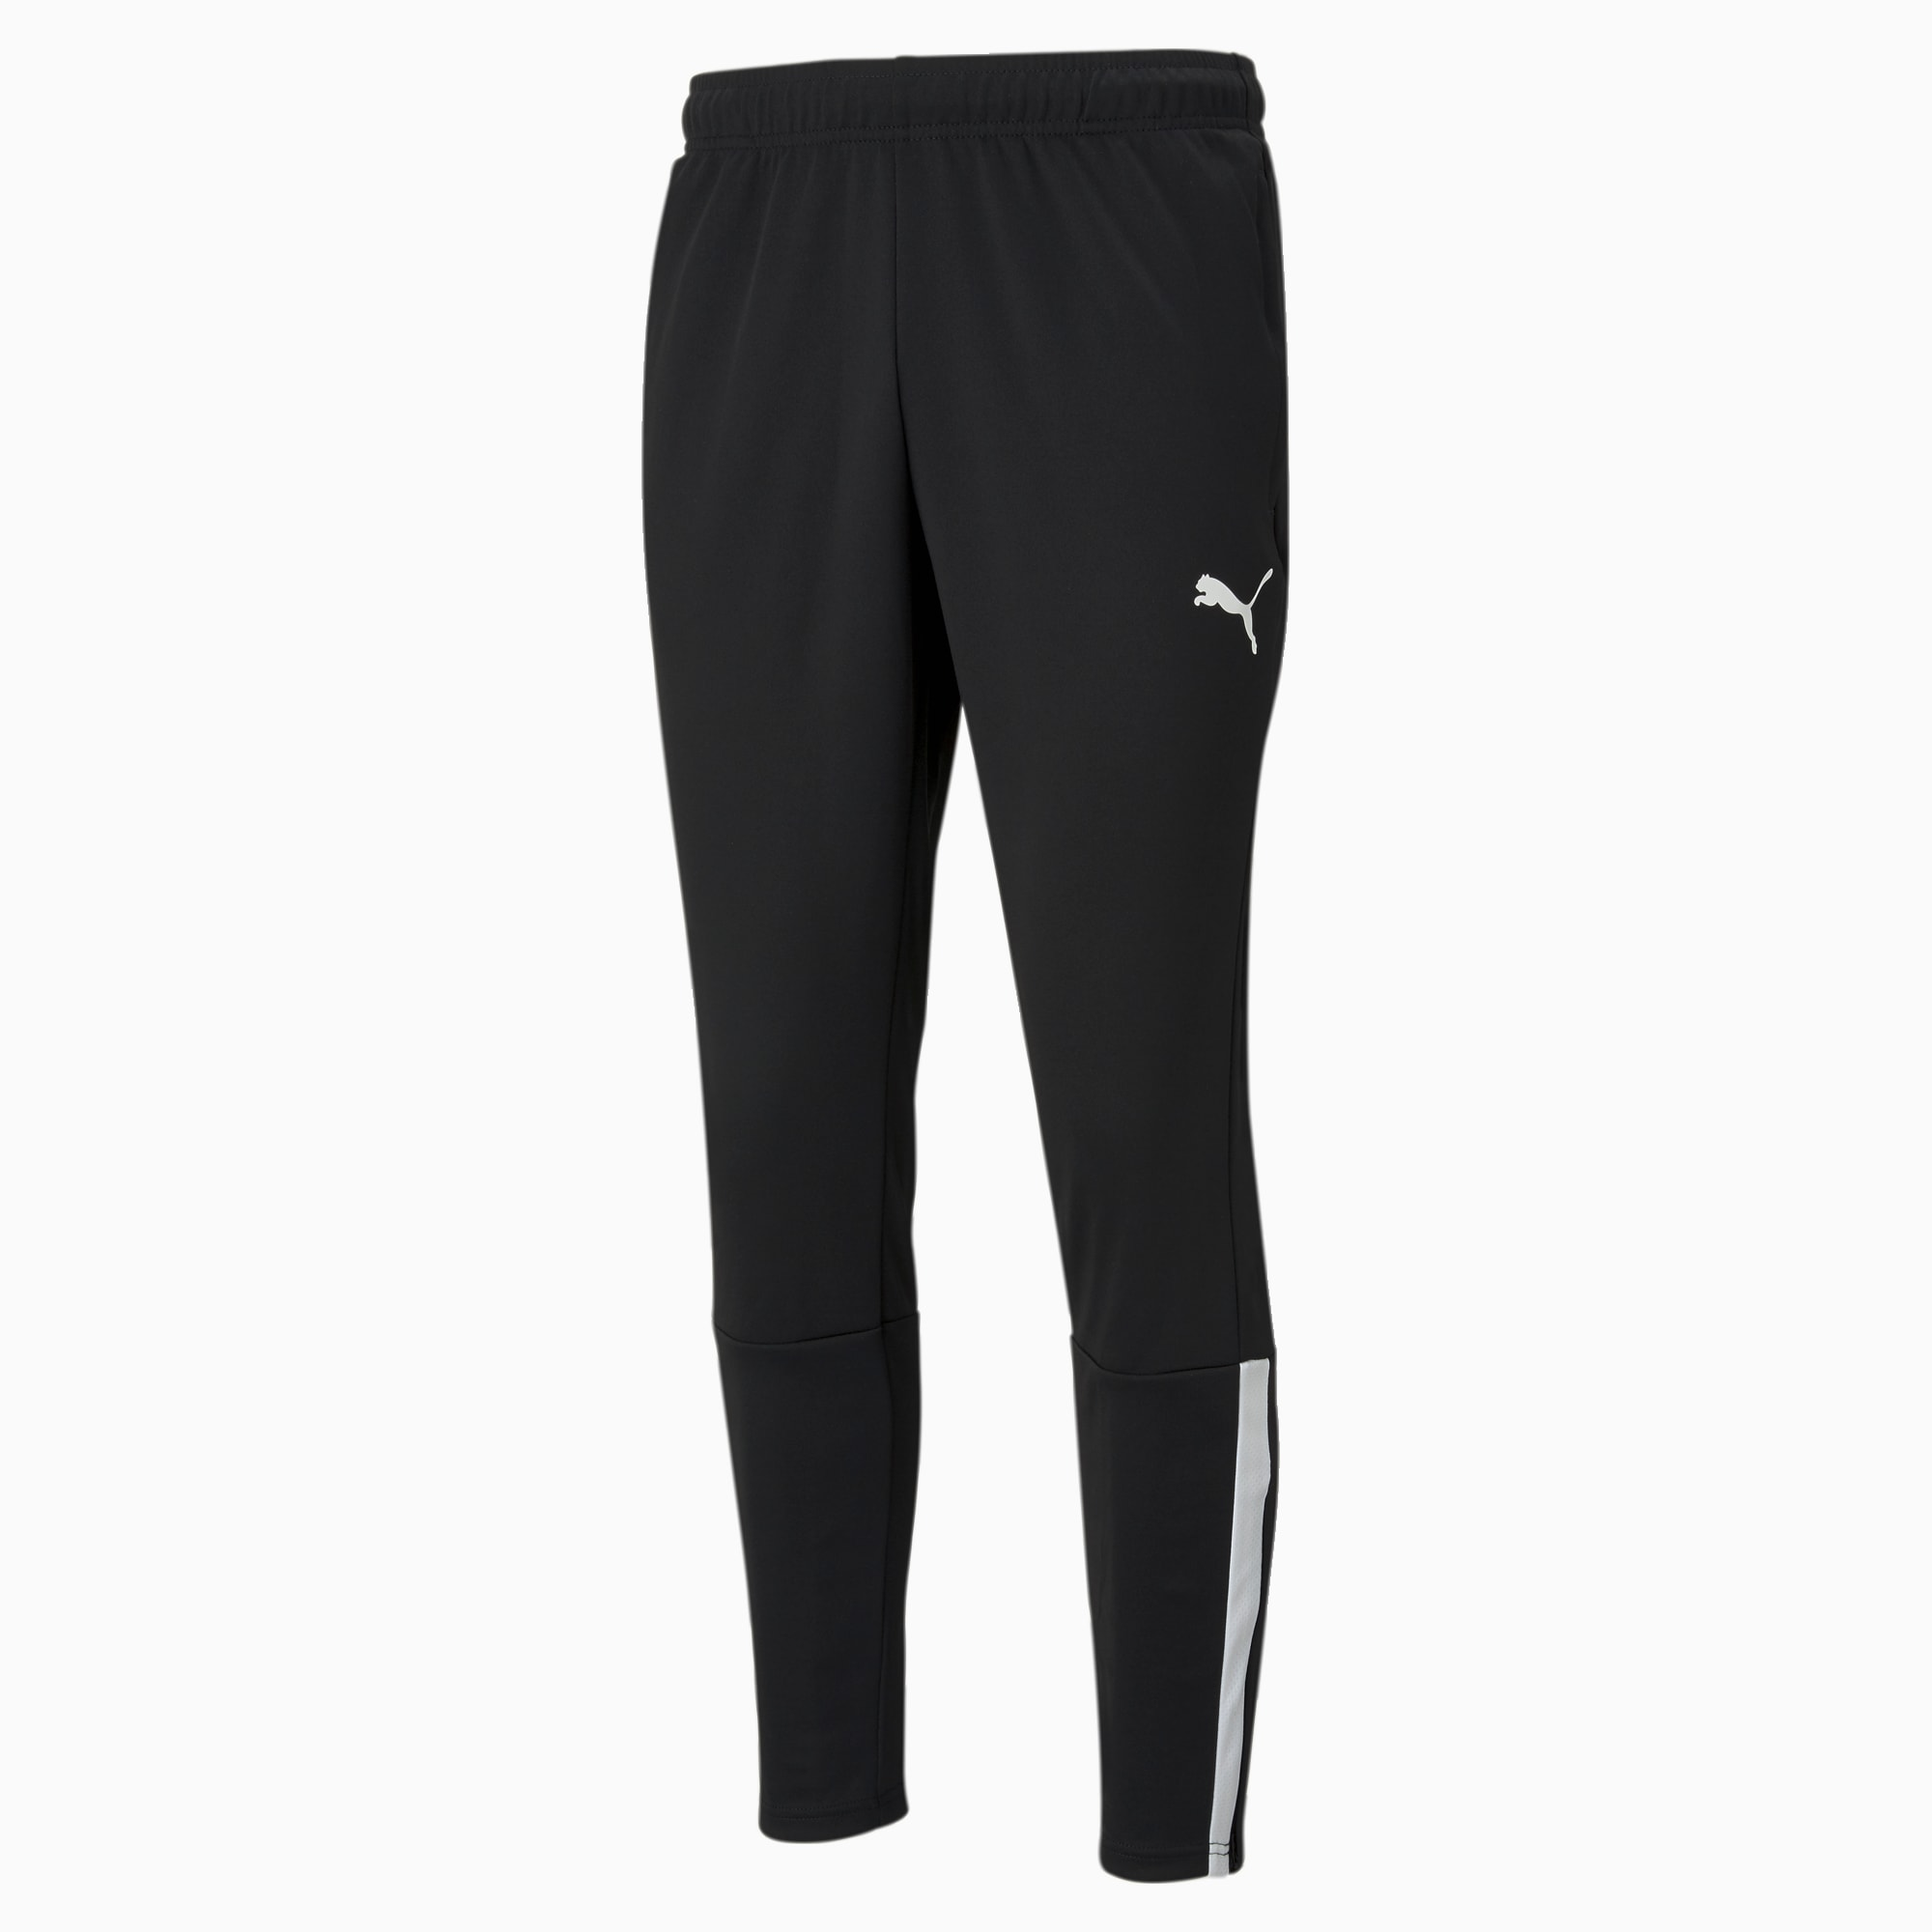 teamLIGA Training Men's Football Pants